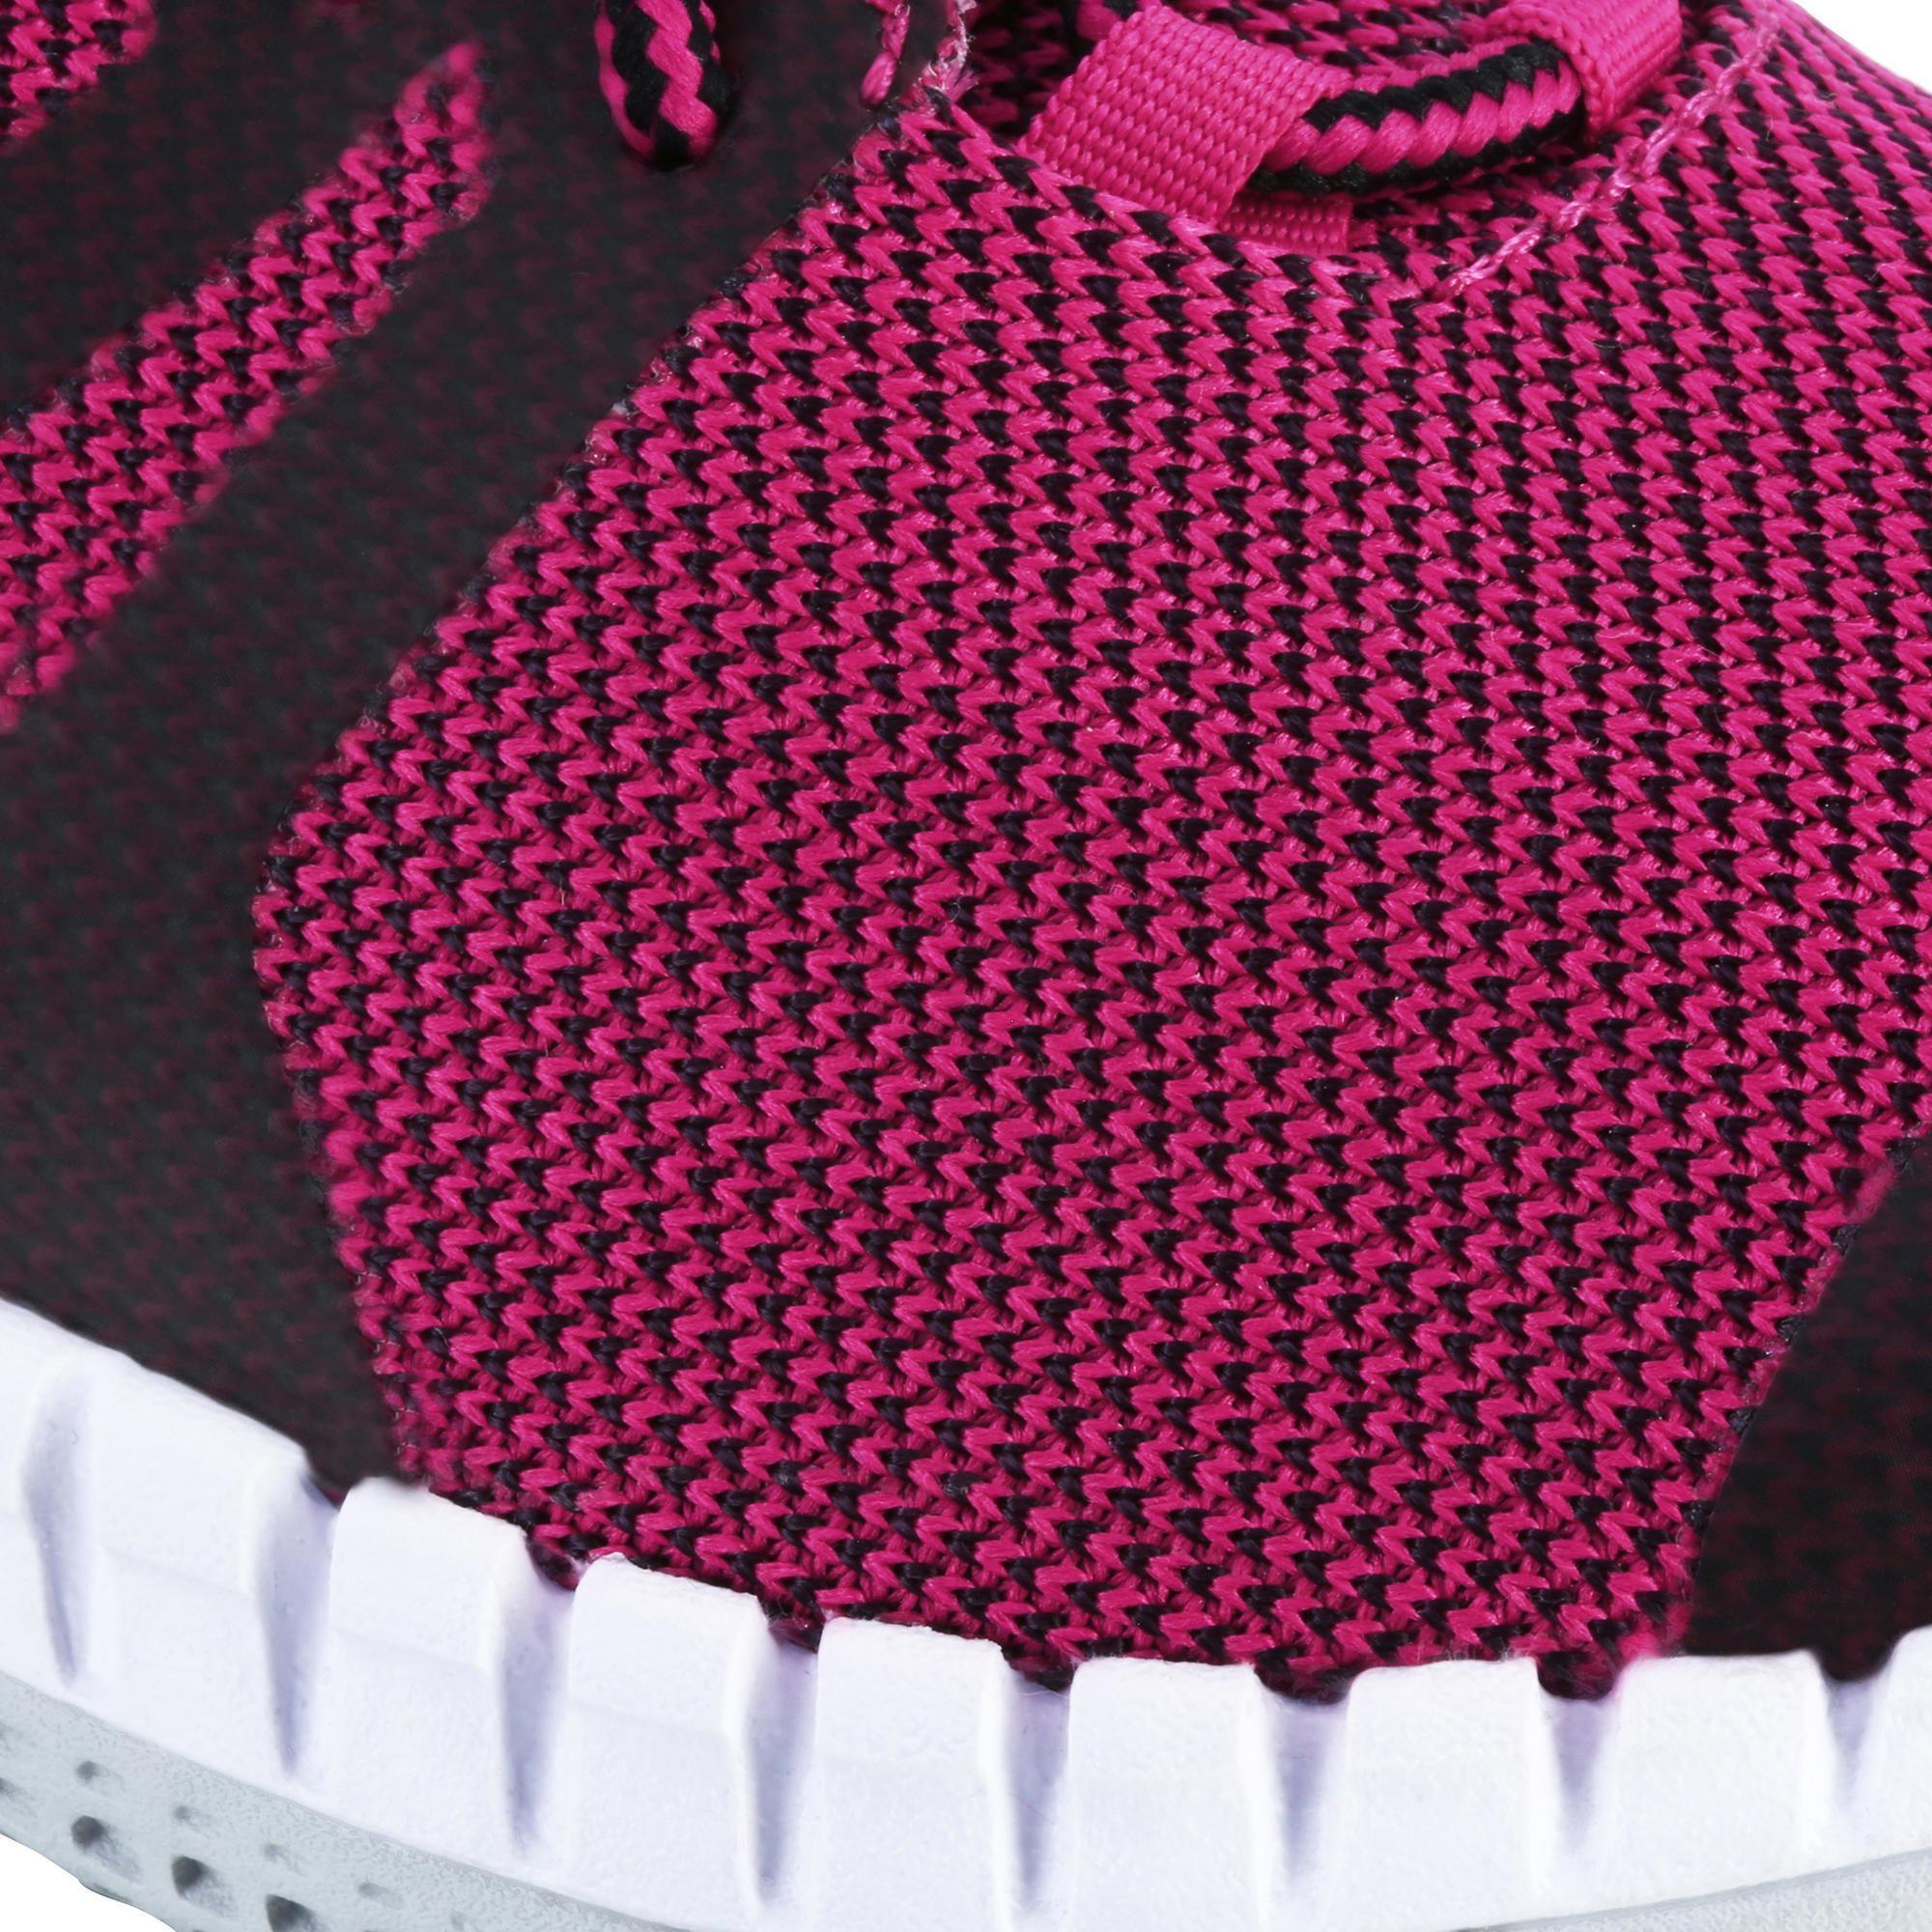 Mujer De Reebok Marcha Deportiva Para Zapatillas Rosa Walk Zprint AT67qxwx 3844b284a5ebe